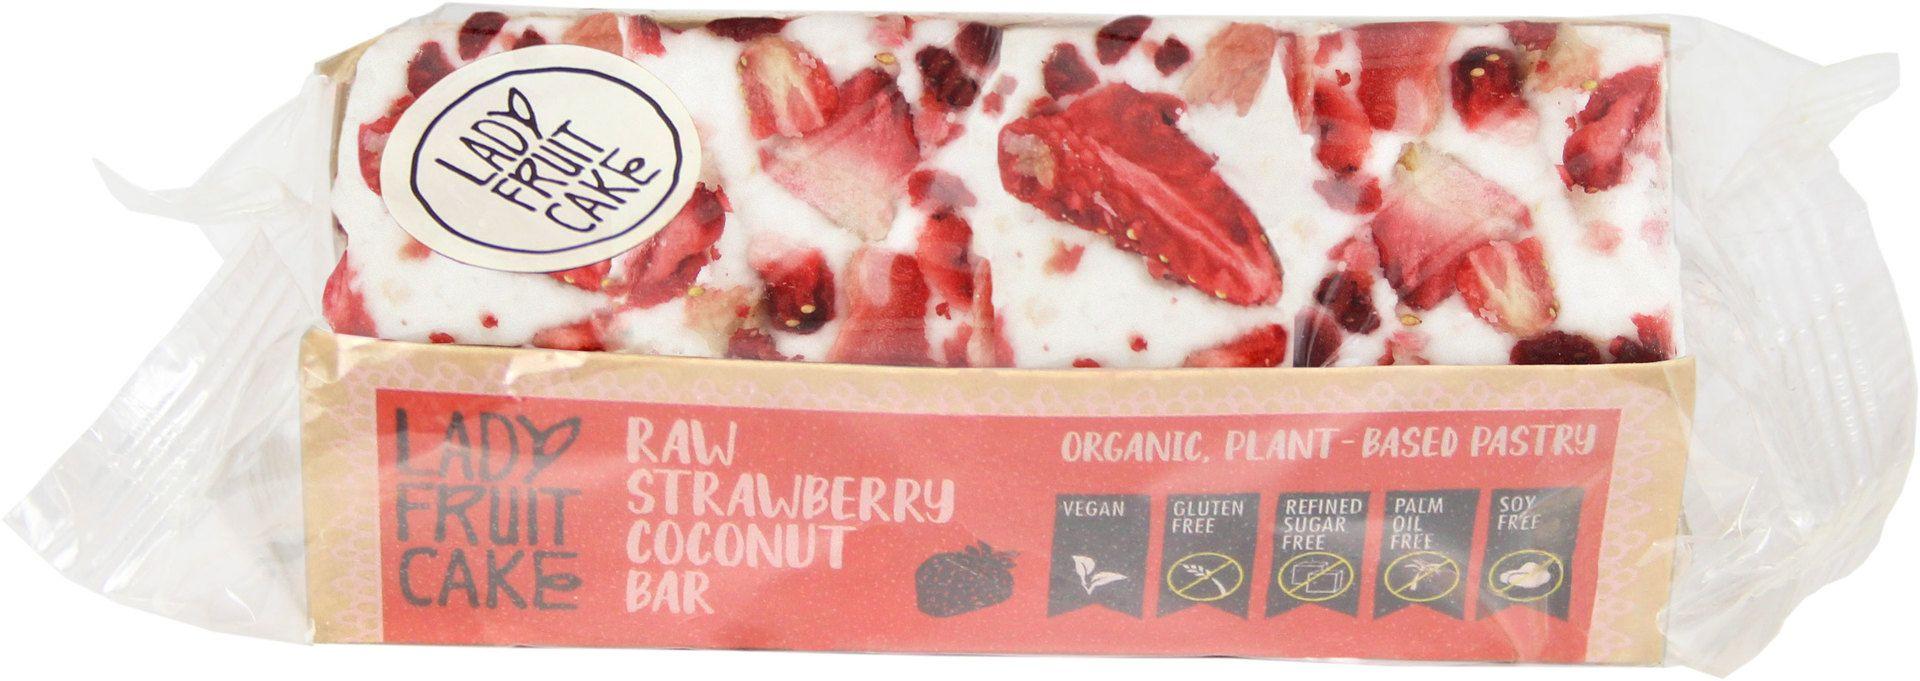 Biologische LadyFruitCake RAW aardbei/kokos bar 70 gr